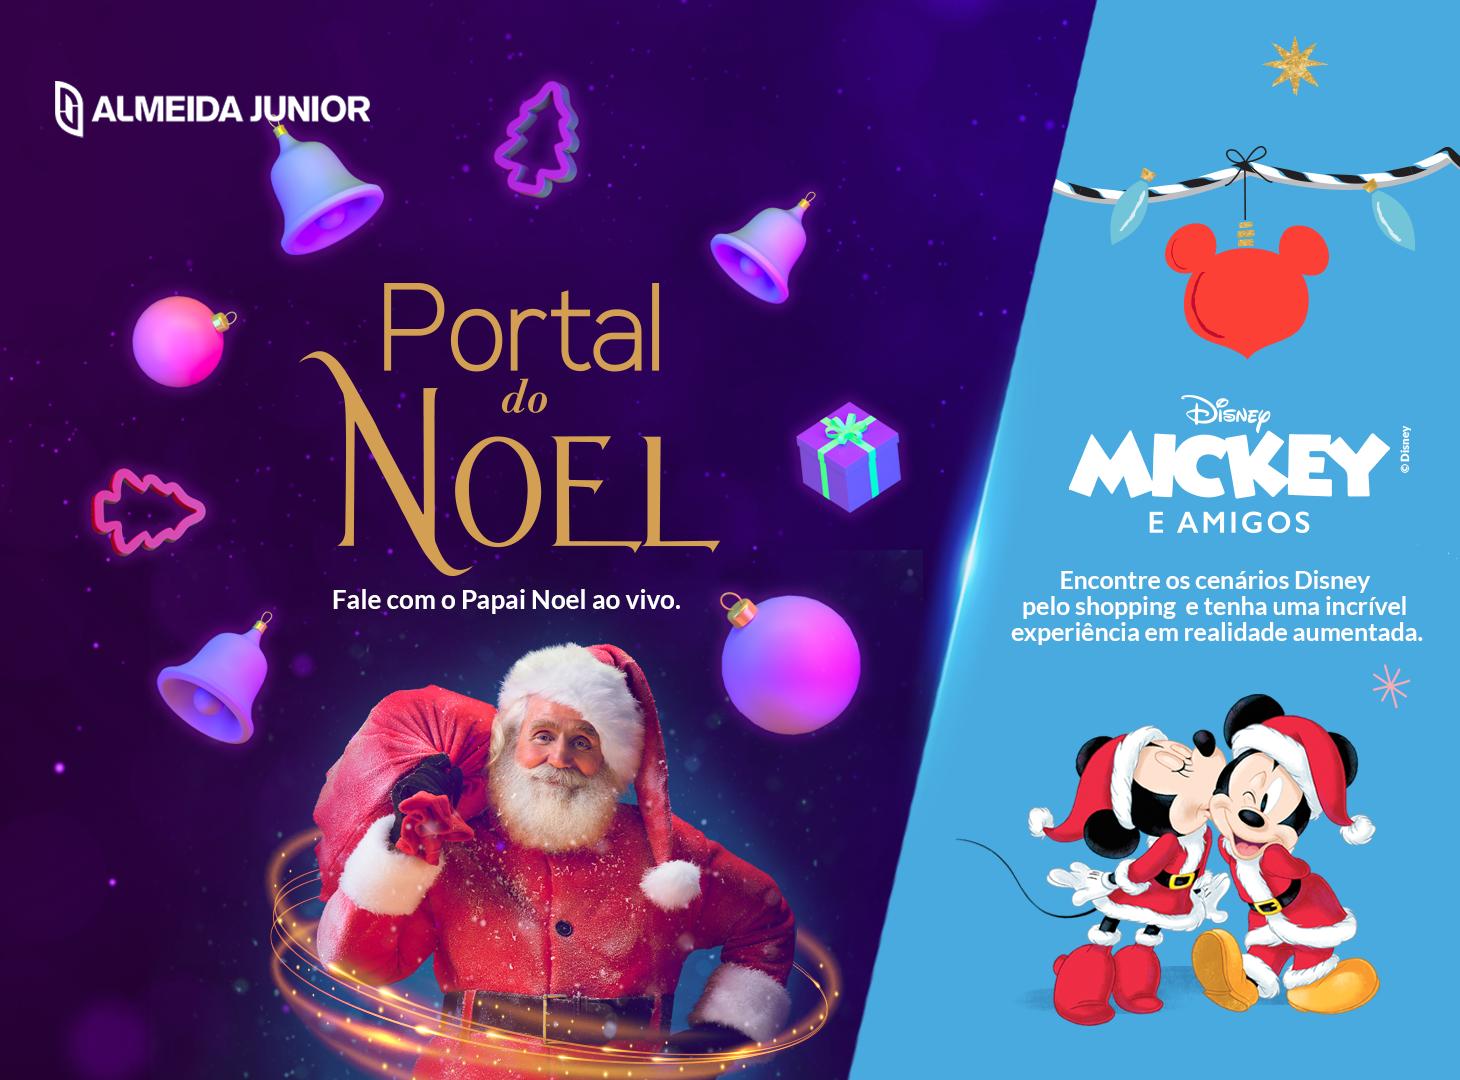 Digital Christmas Magic: Disney and Santa interactive attractions will surprise